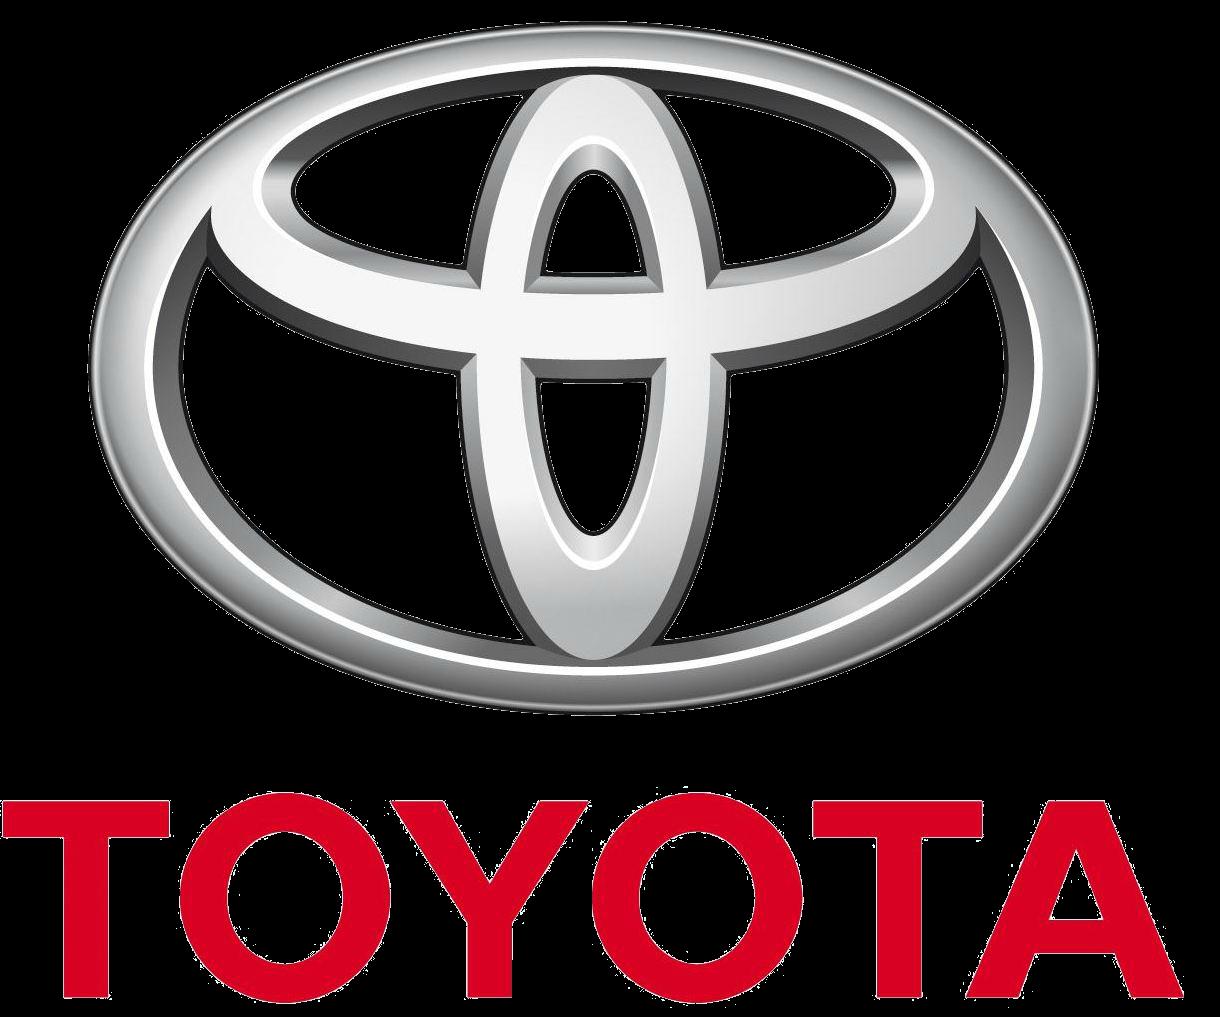 Toyota beveiliging HD Camerabewaking Mistmachine generator Alarmsysteem Overval knop paniek alarmsystemen rolluiken Bulgarijen Turkije Turkiye Guvenlik